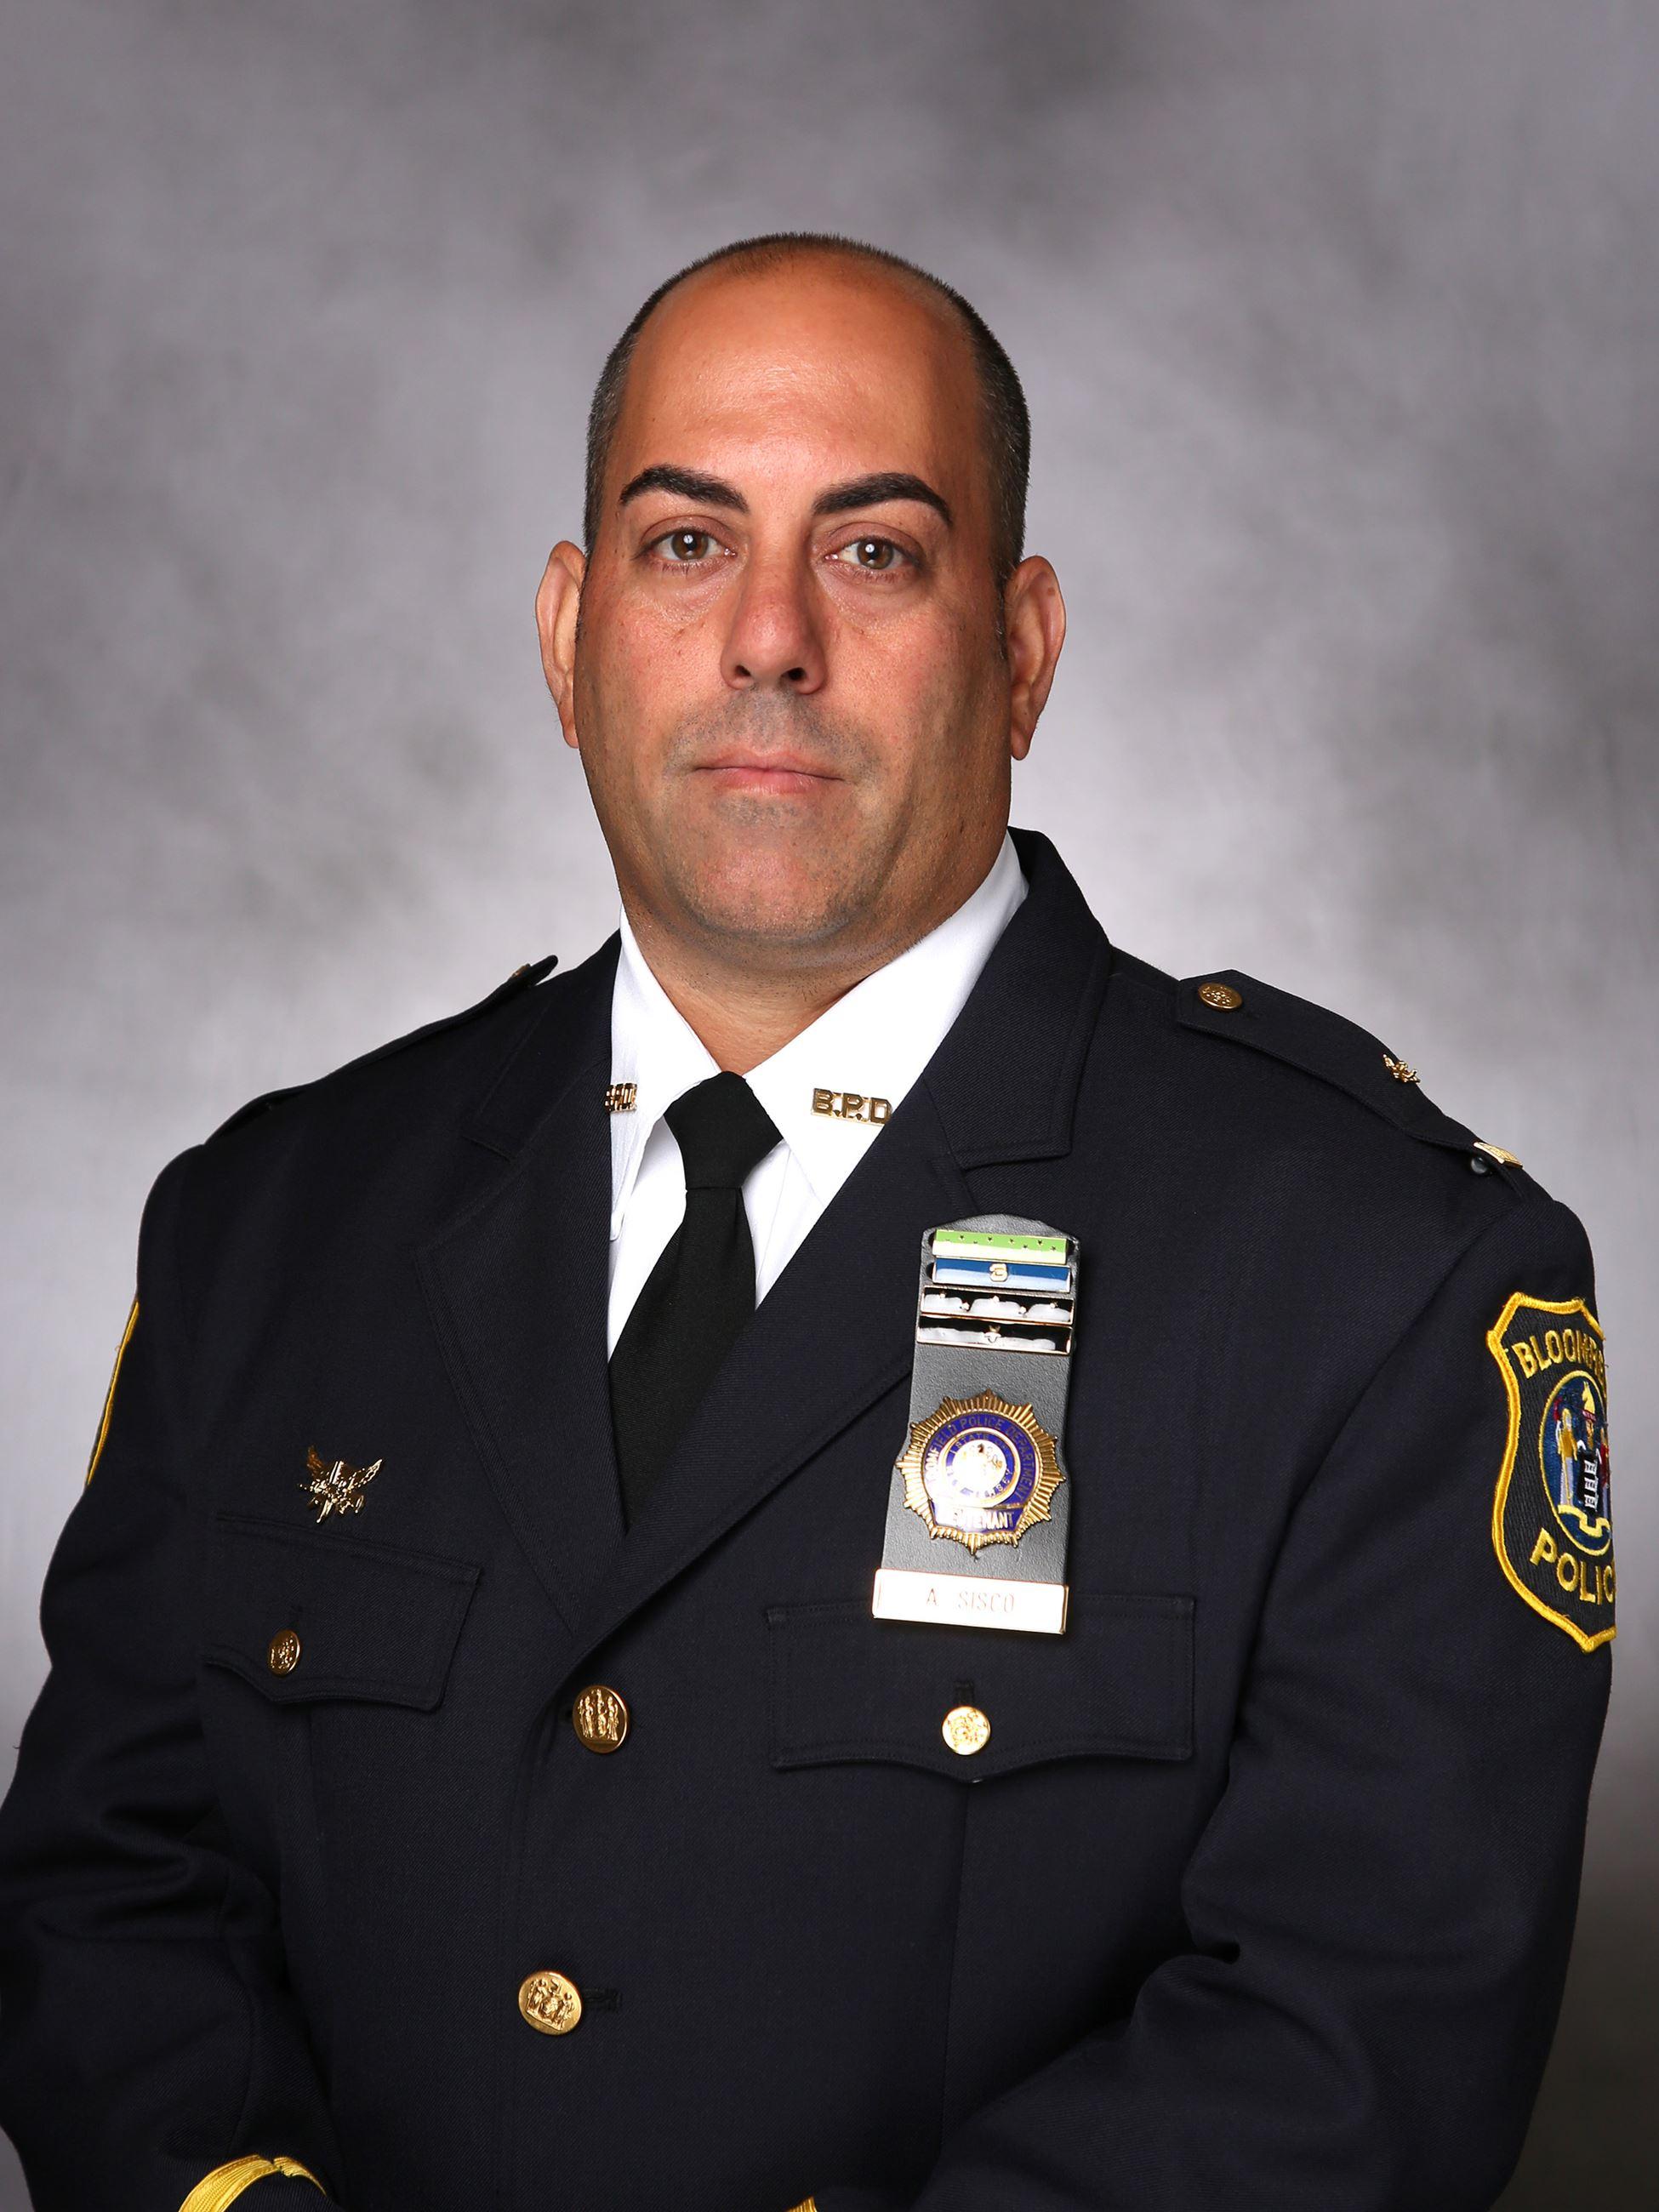 Lieutenant Anthony Sisco